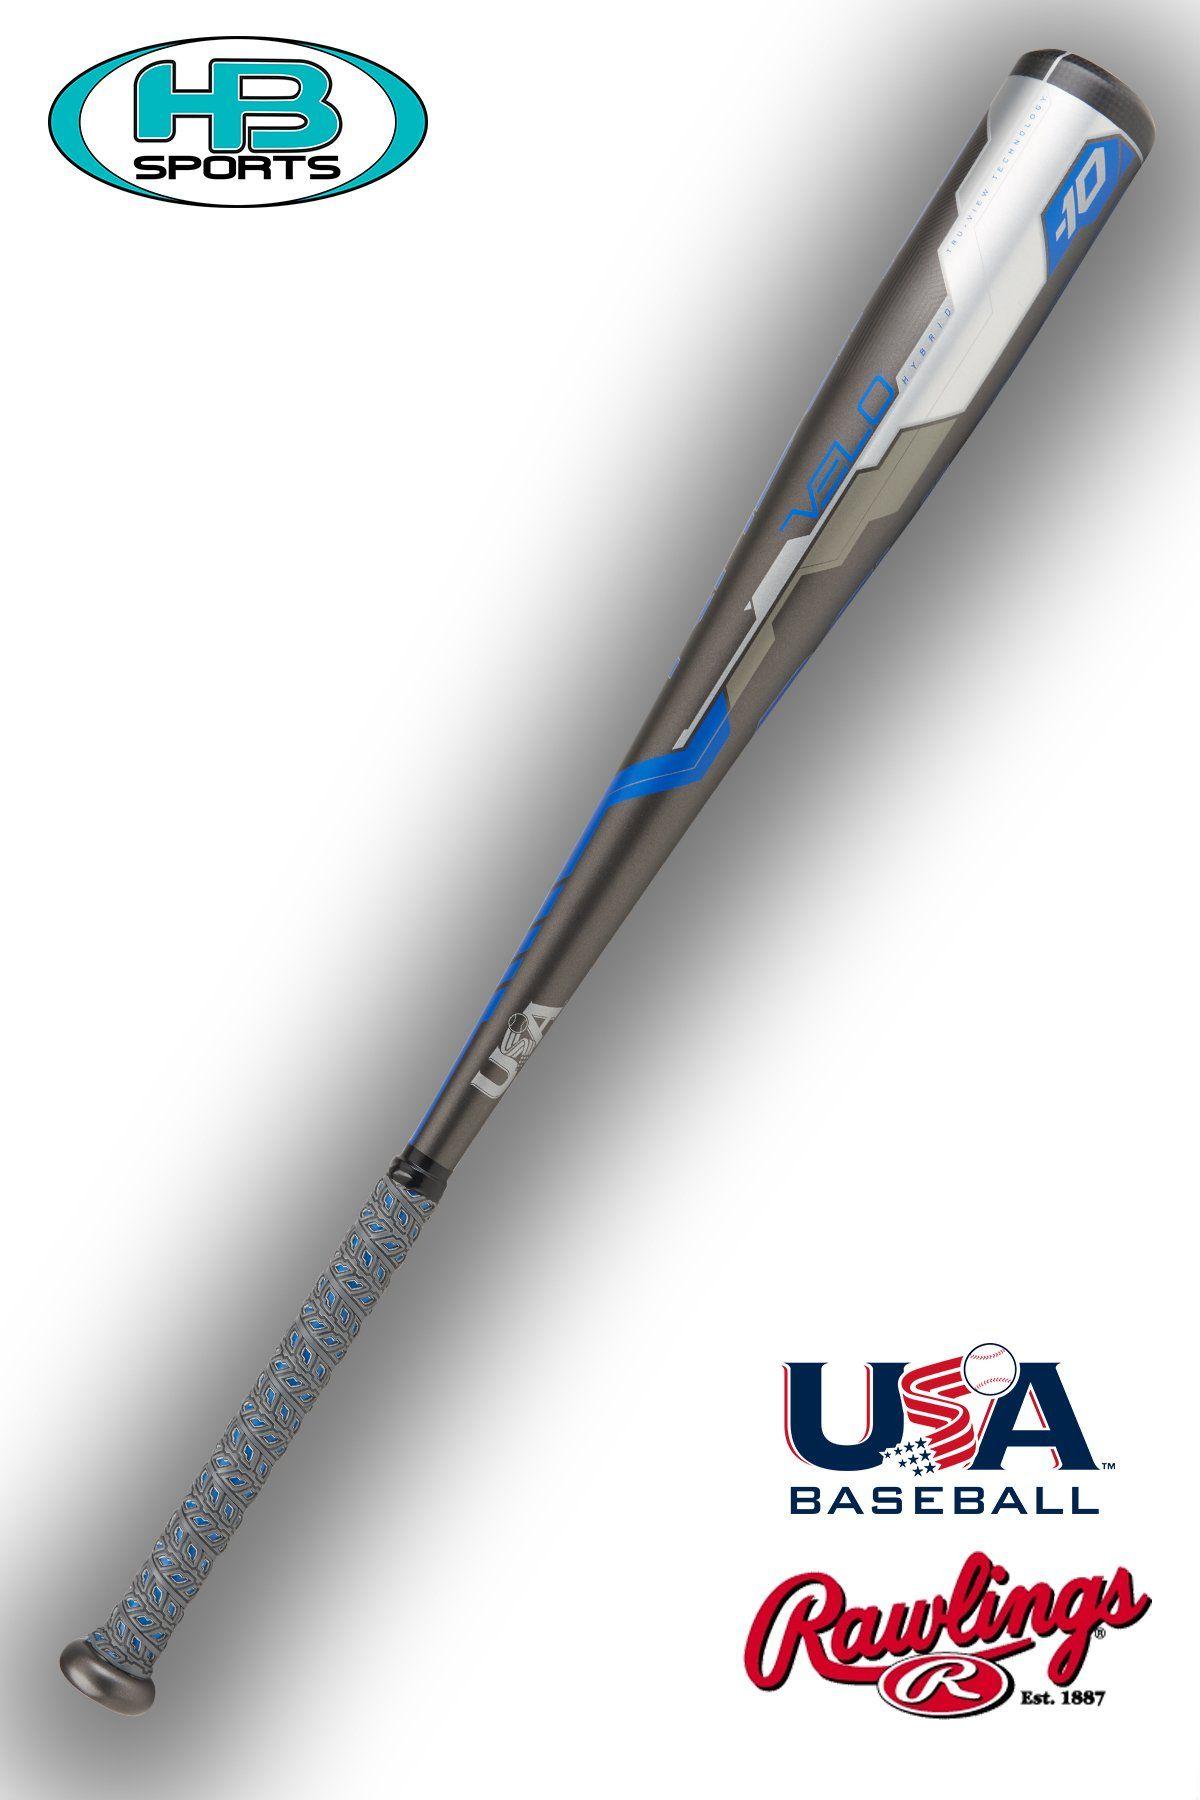 US8V10 Alloy /& Composite Youth USA Baseball Bat Rawlings Velo -10